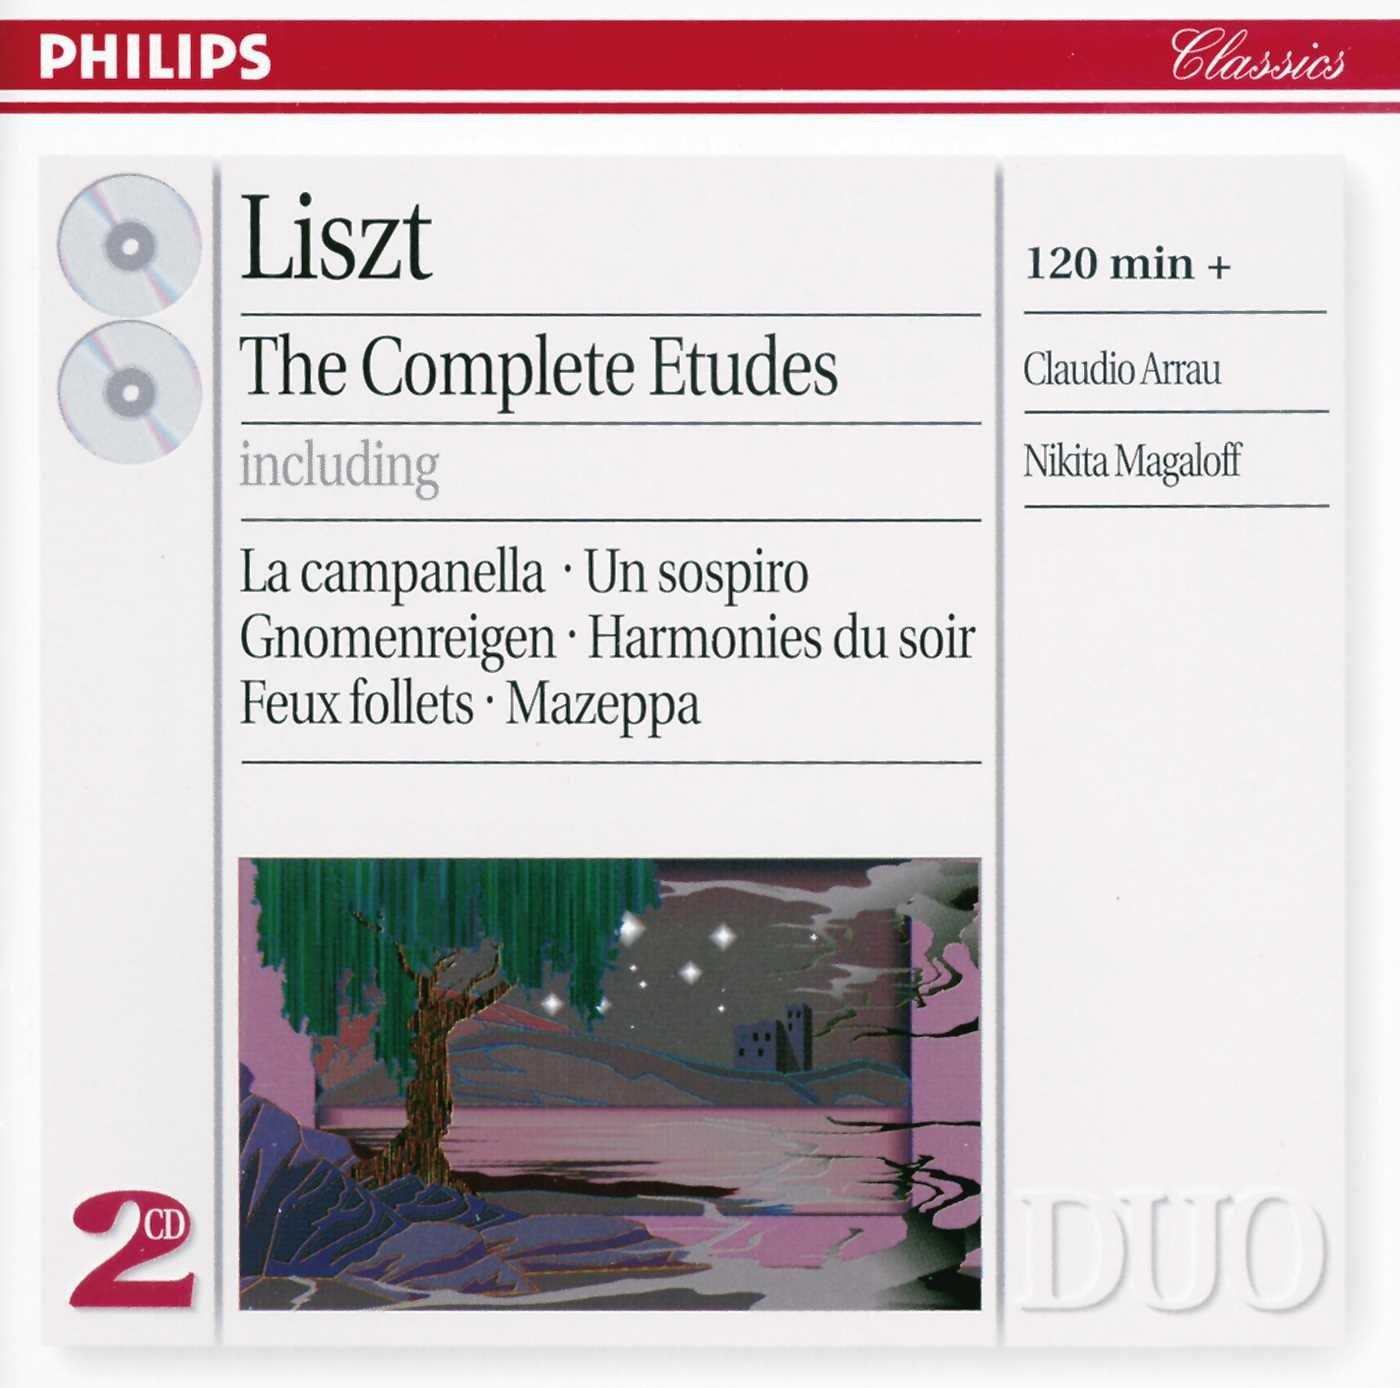 Liszt: Bargain Charlotte Mall The Complete Etudes